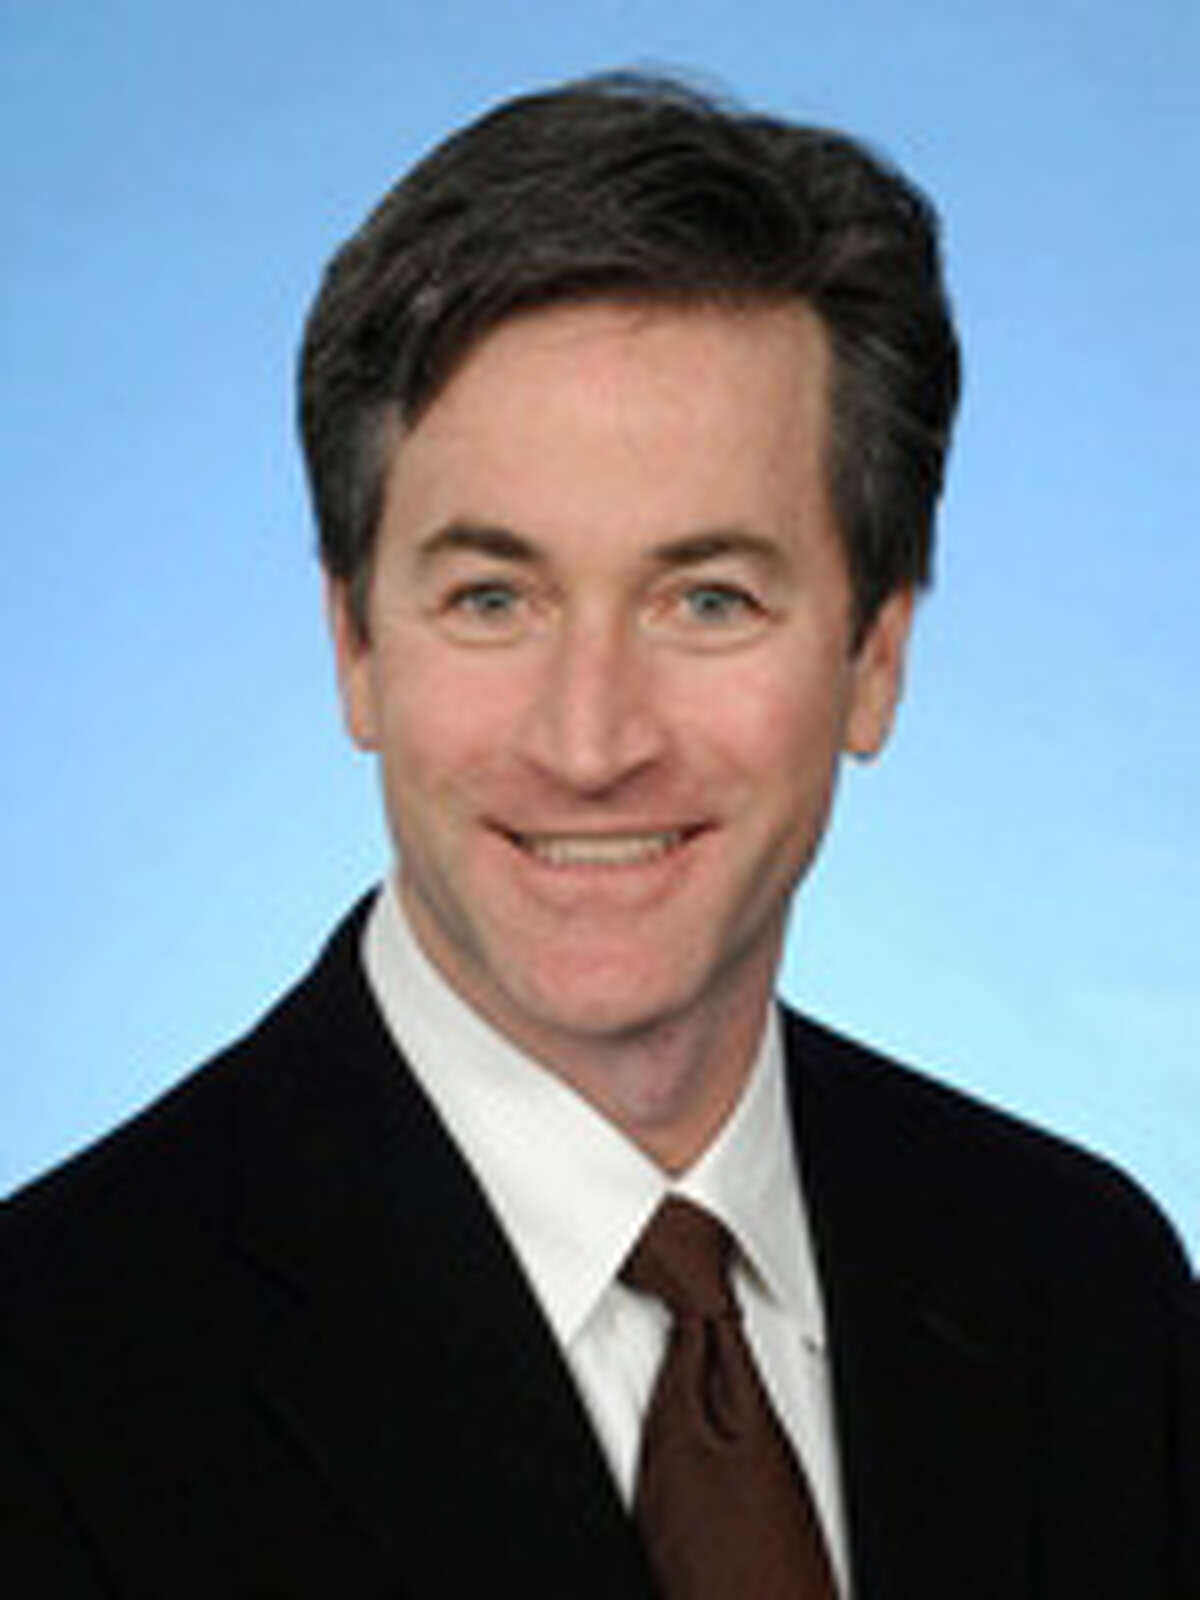 David B. Corry, M.D. Chief, Immunology, Allergy and Rheumatology